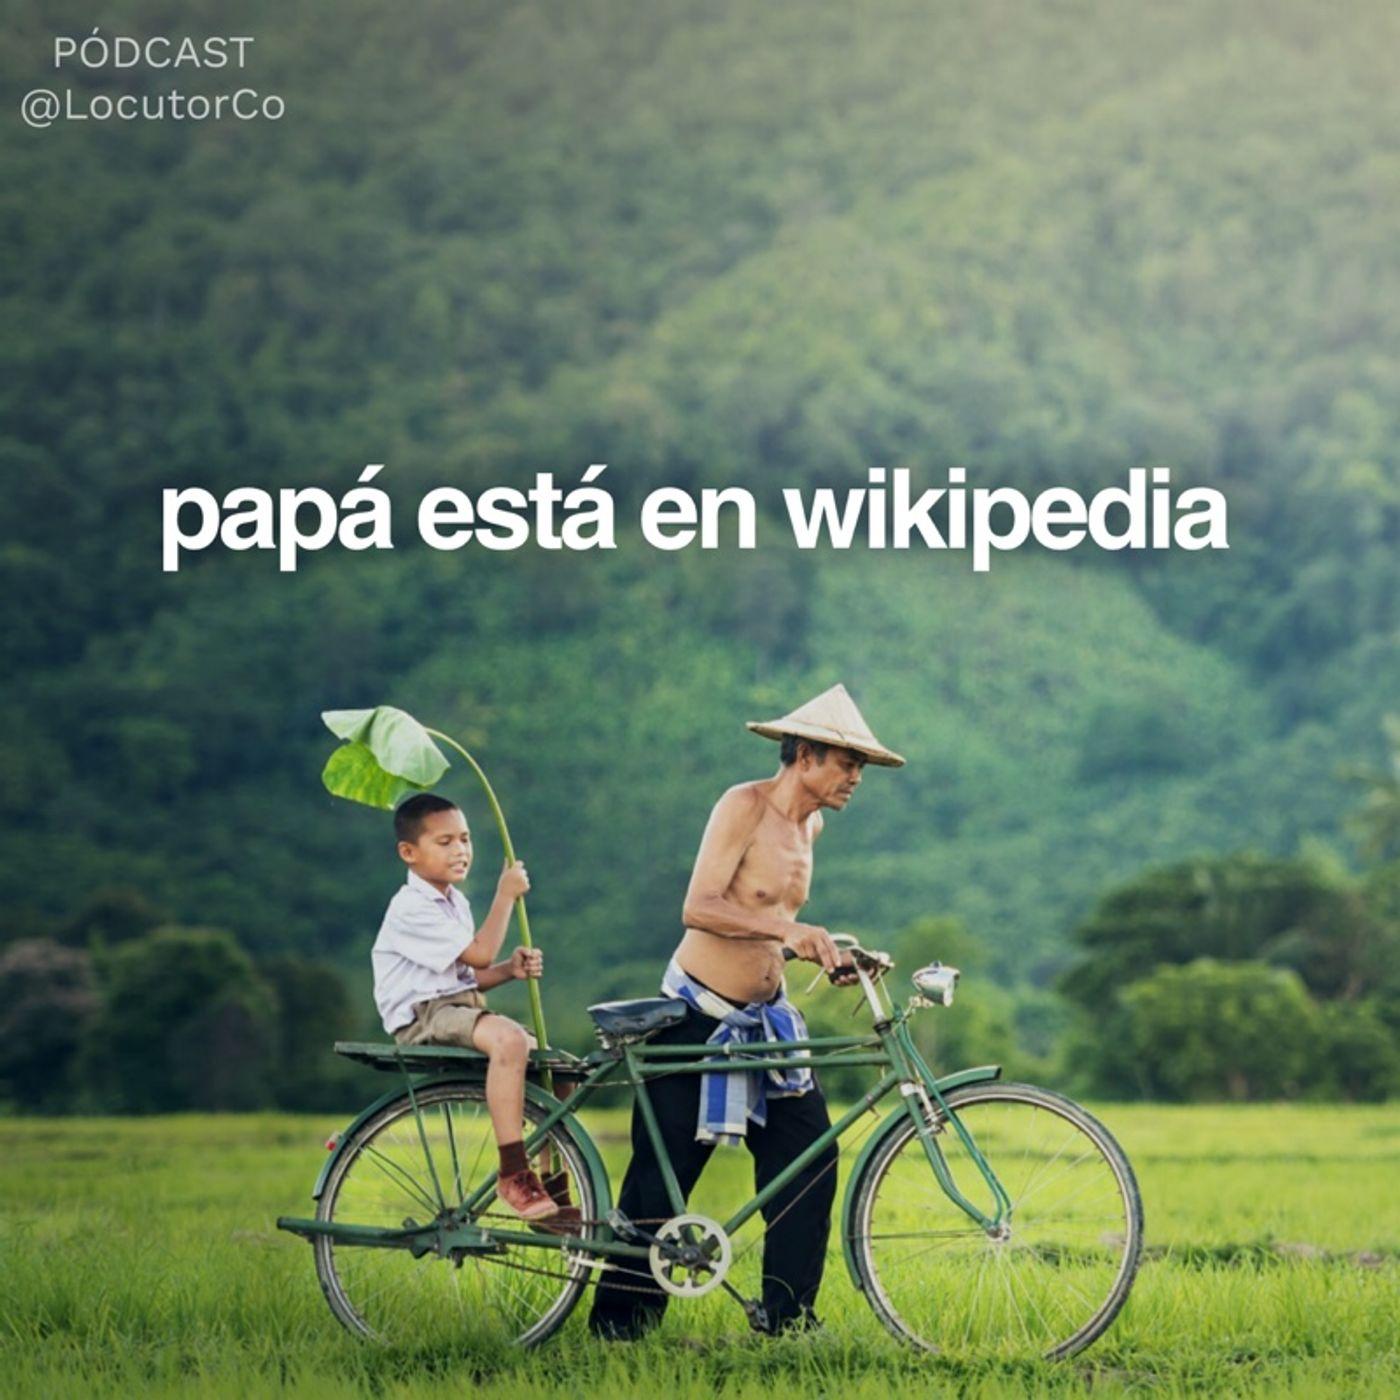 Papá está en wikipedia